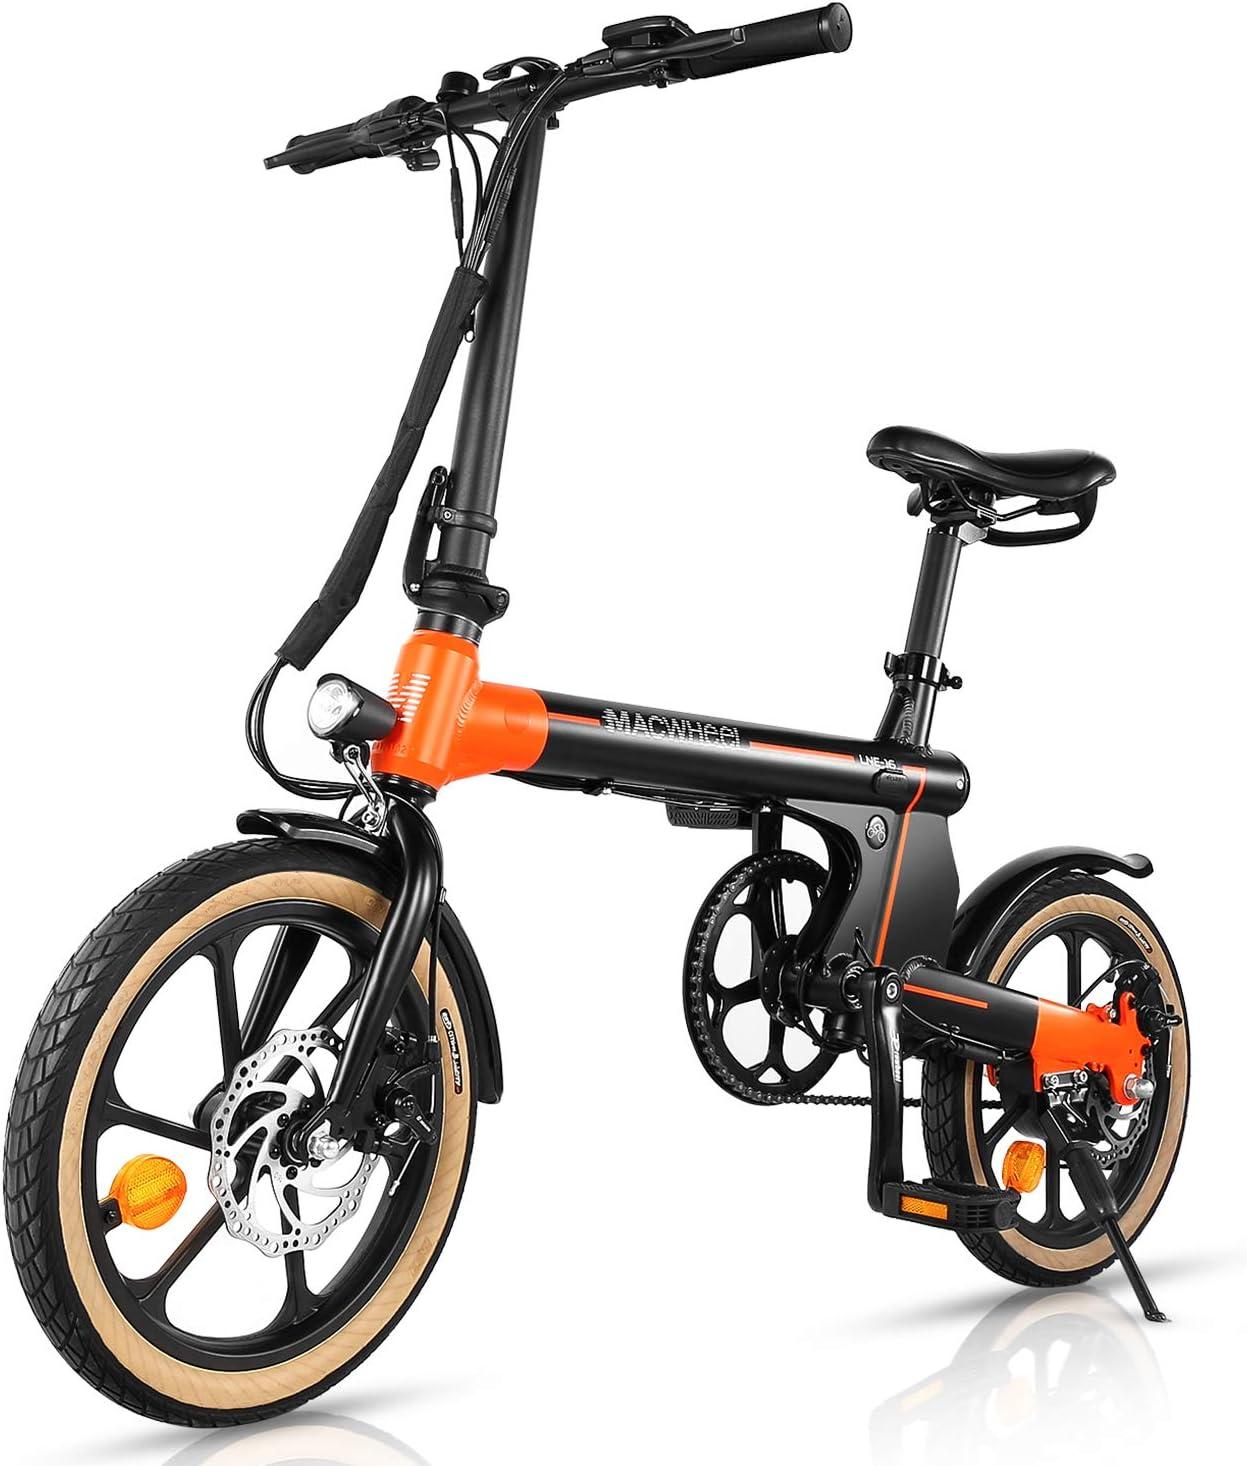 Macwheel Portable Folding Electric Bike